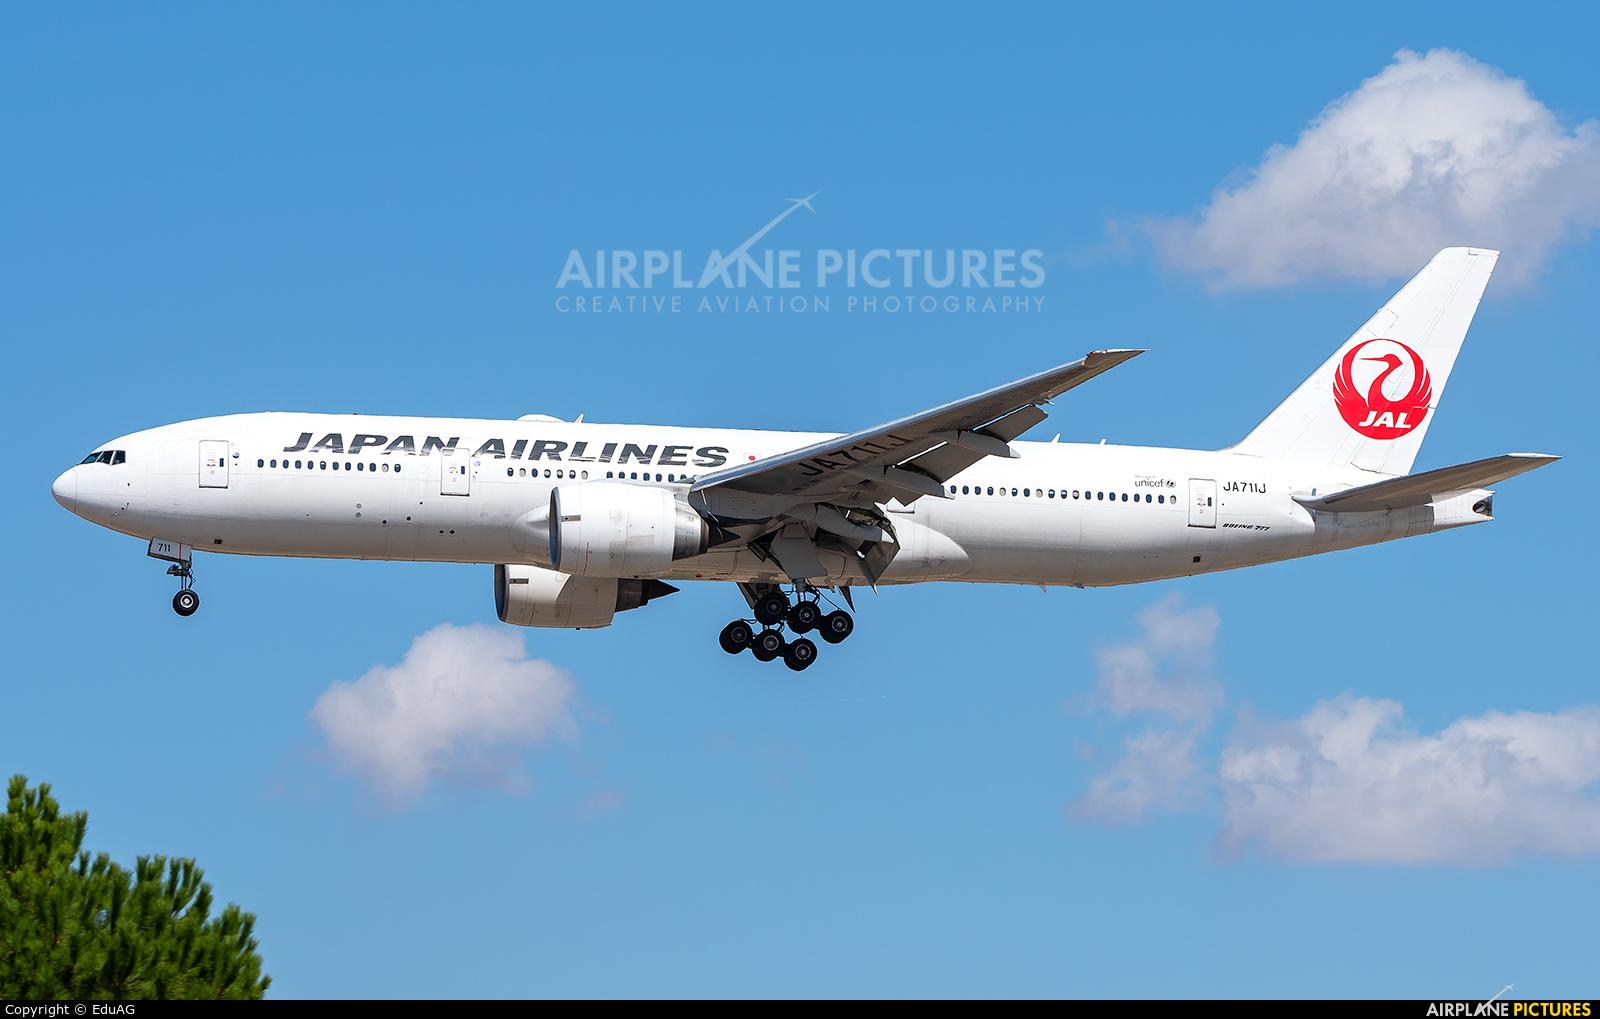 JAL - Japan Airlines JA711J aircraft at Madrid - Barajas